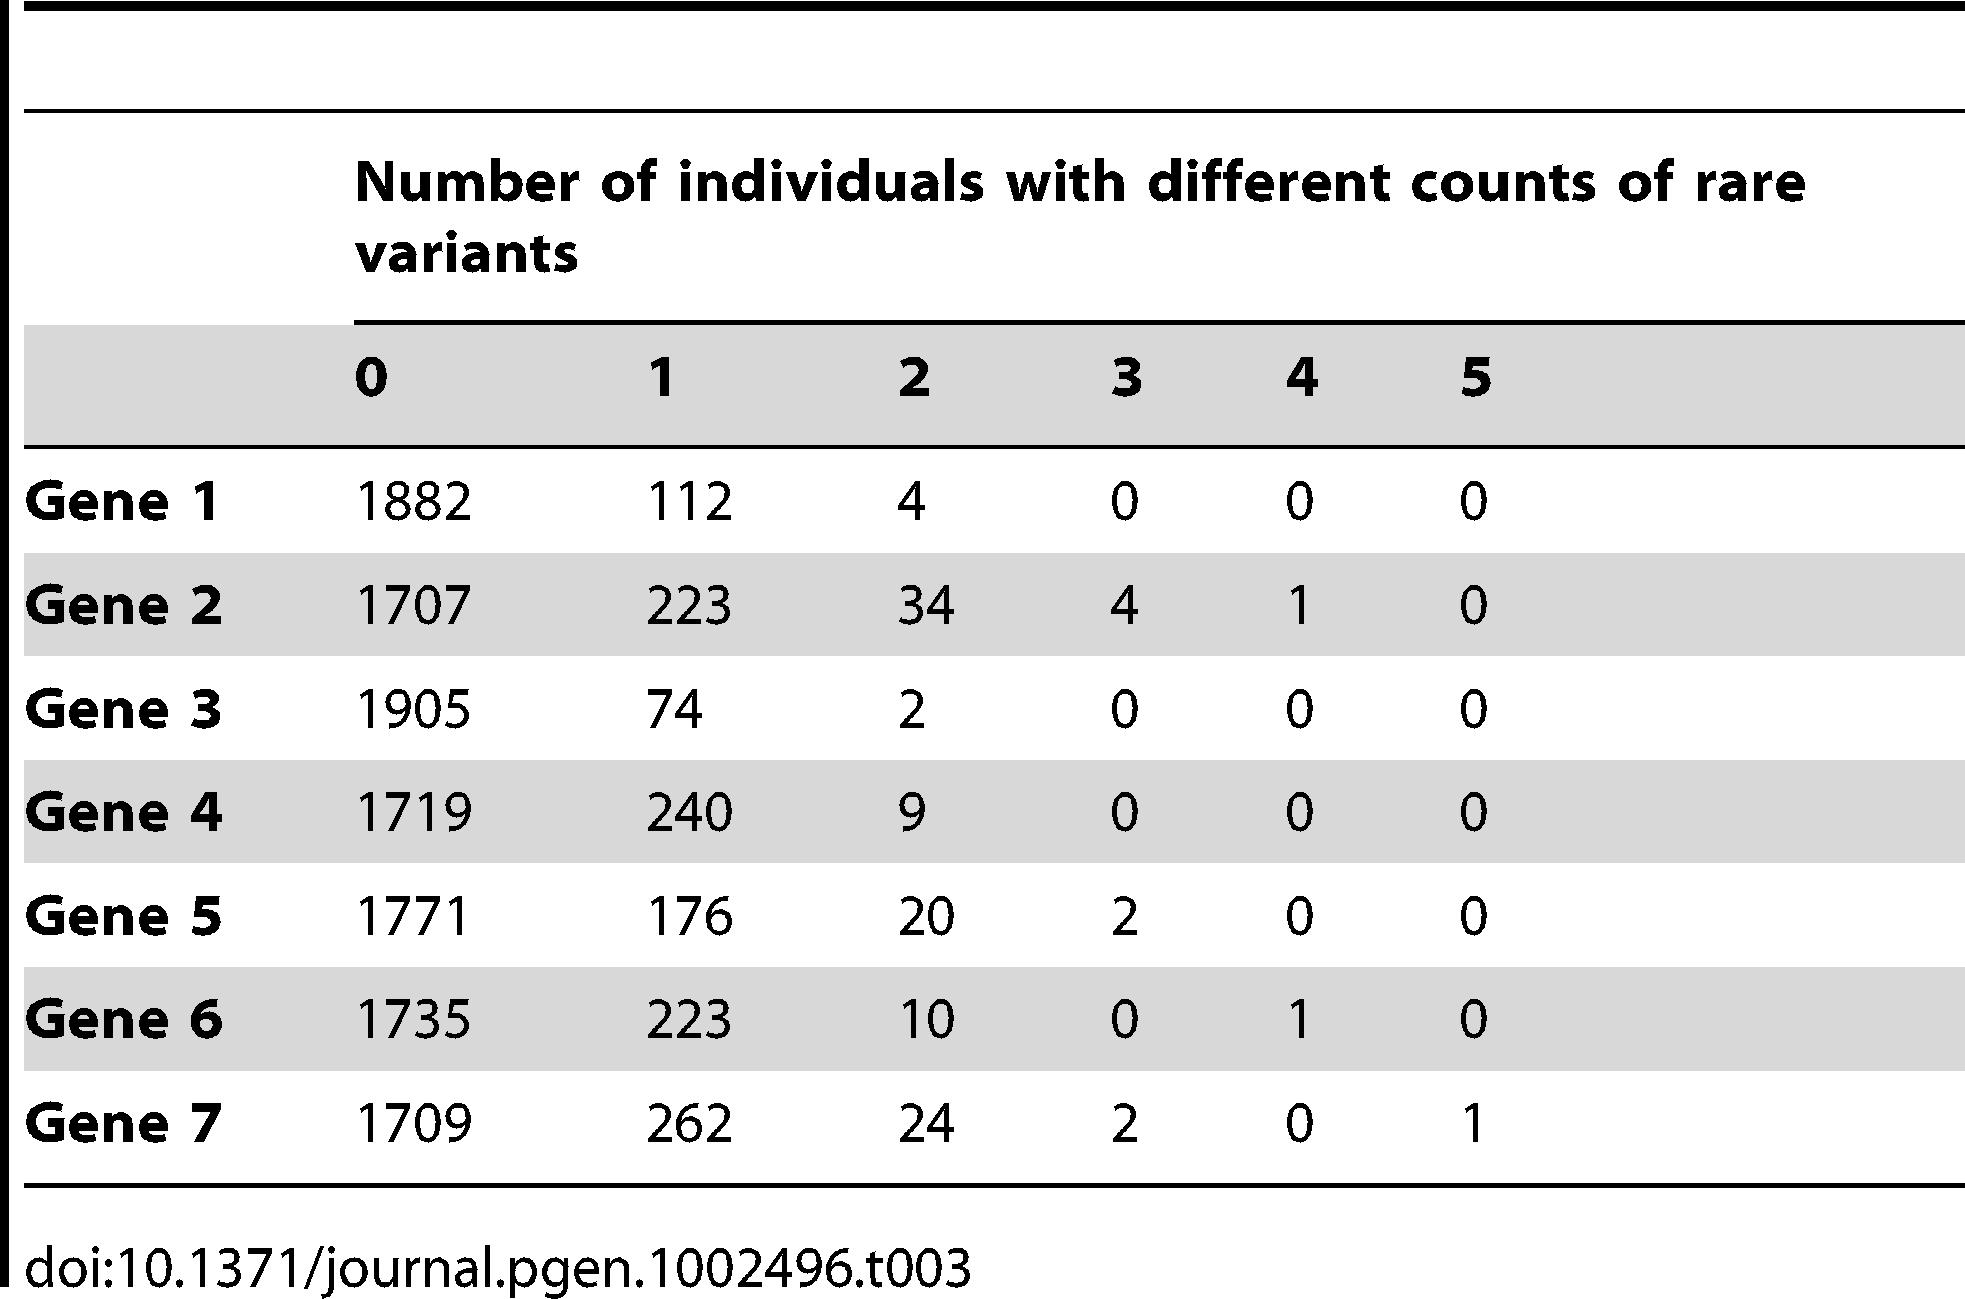 Description of the count of rare variants per gene.